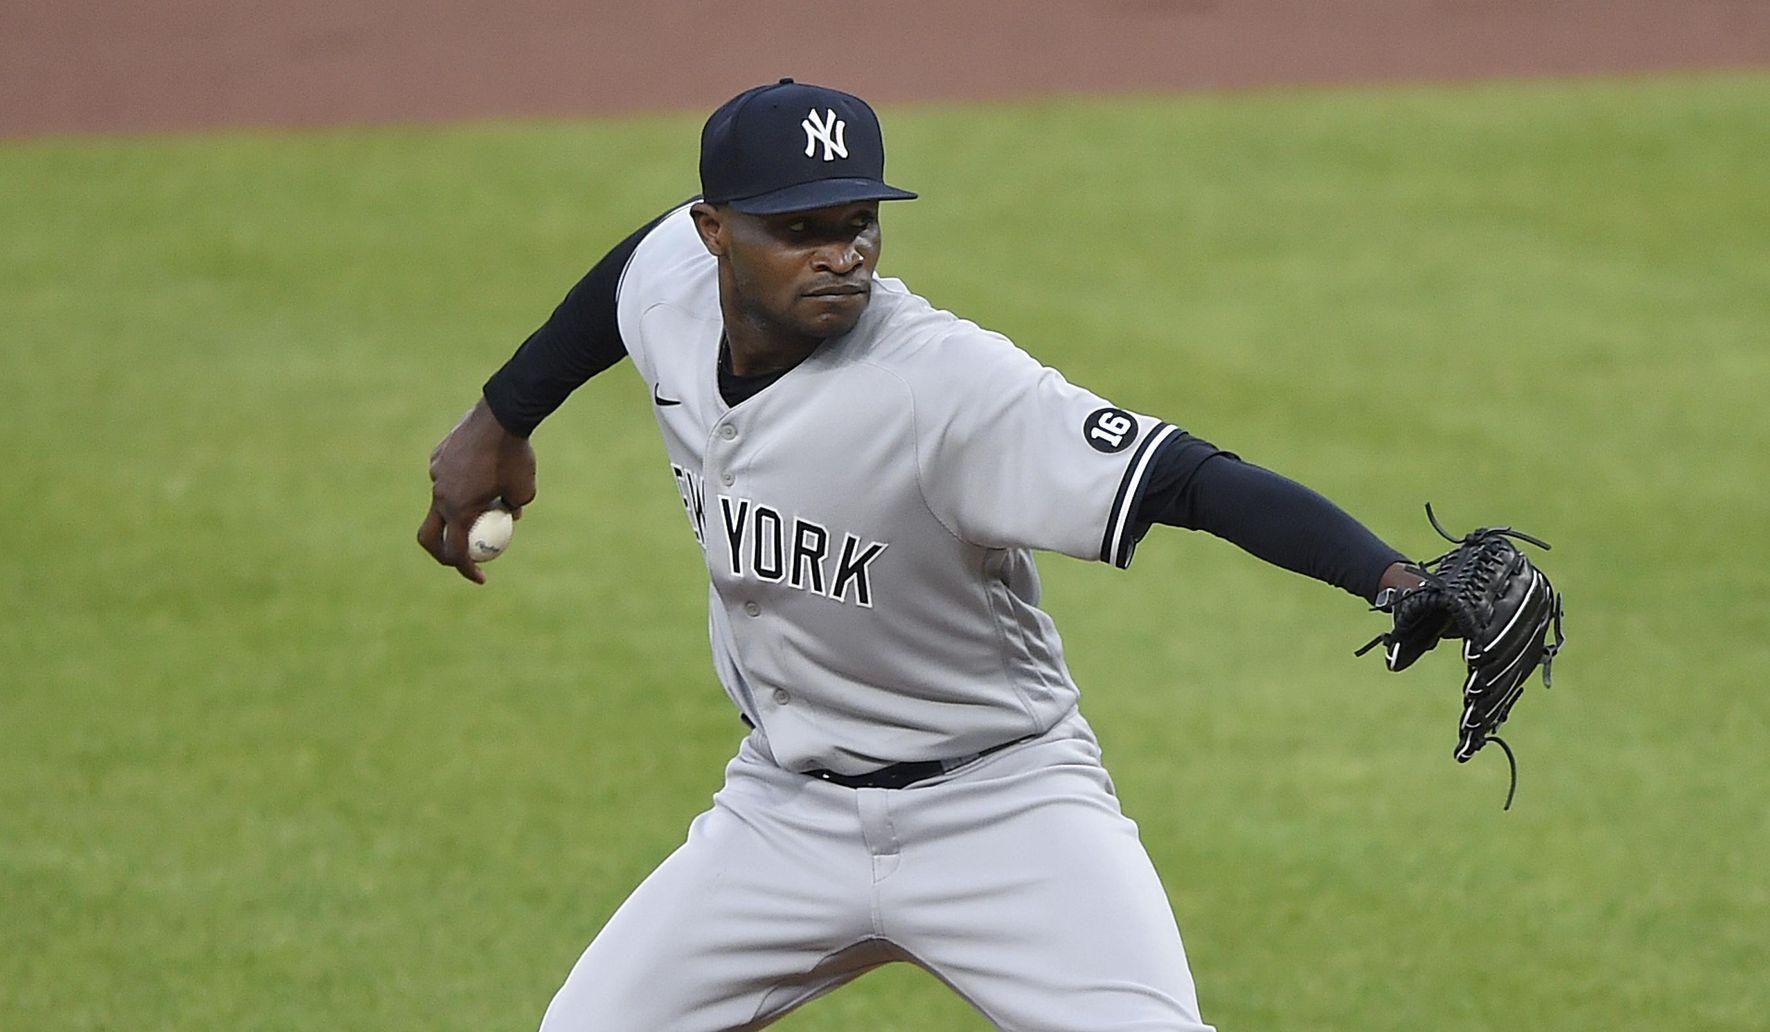 Yankees_orioles_baseball_20452_c0-113-2700-1687_s1770x1032